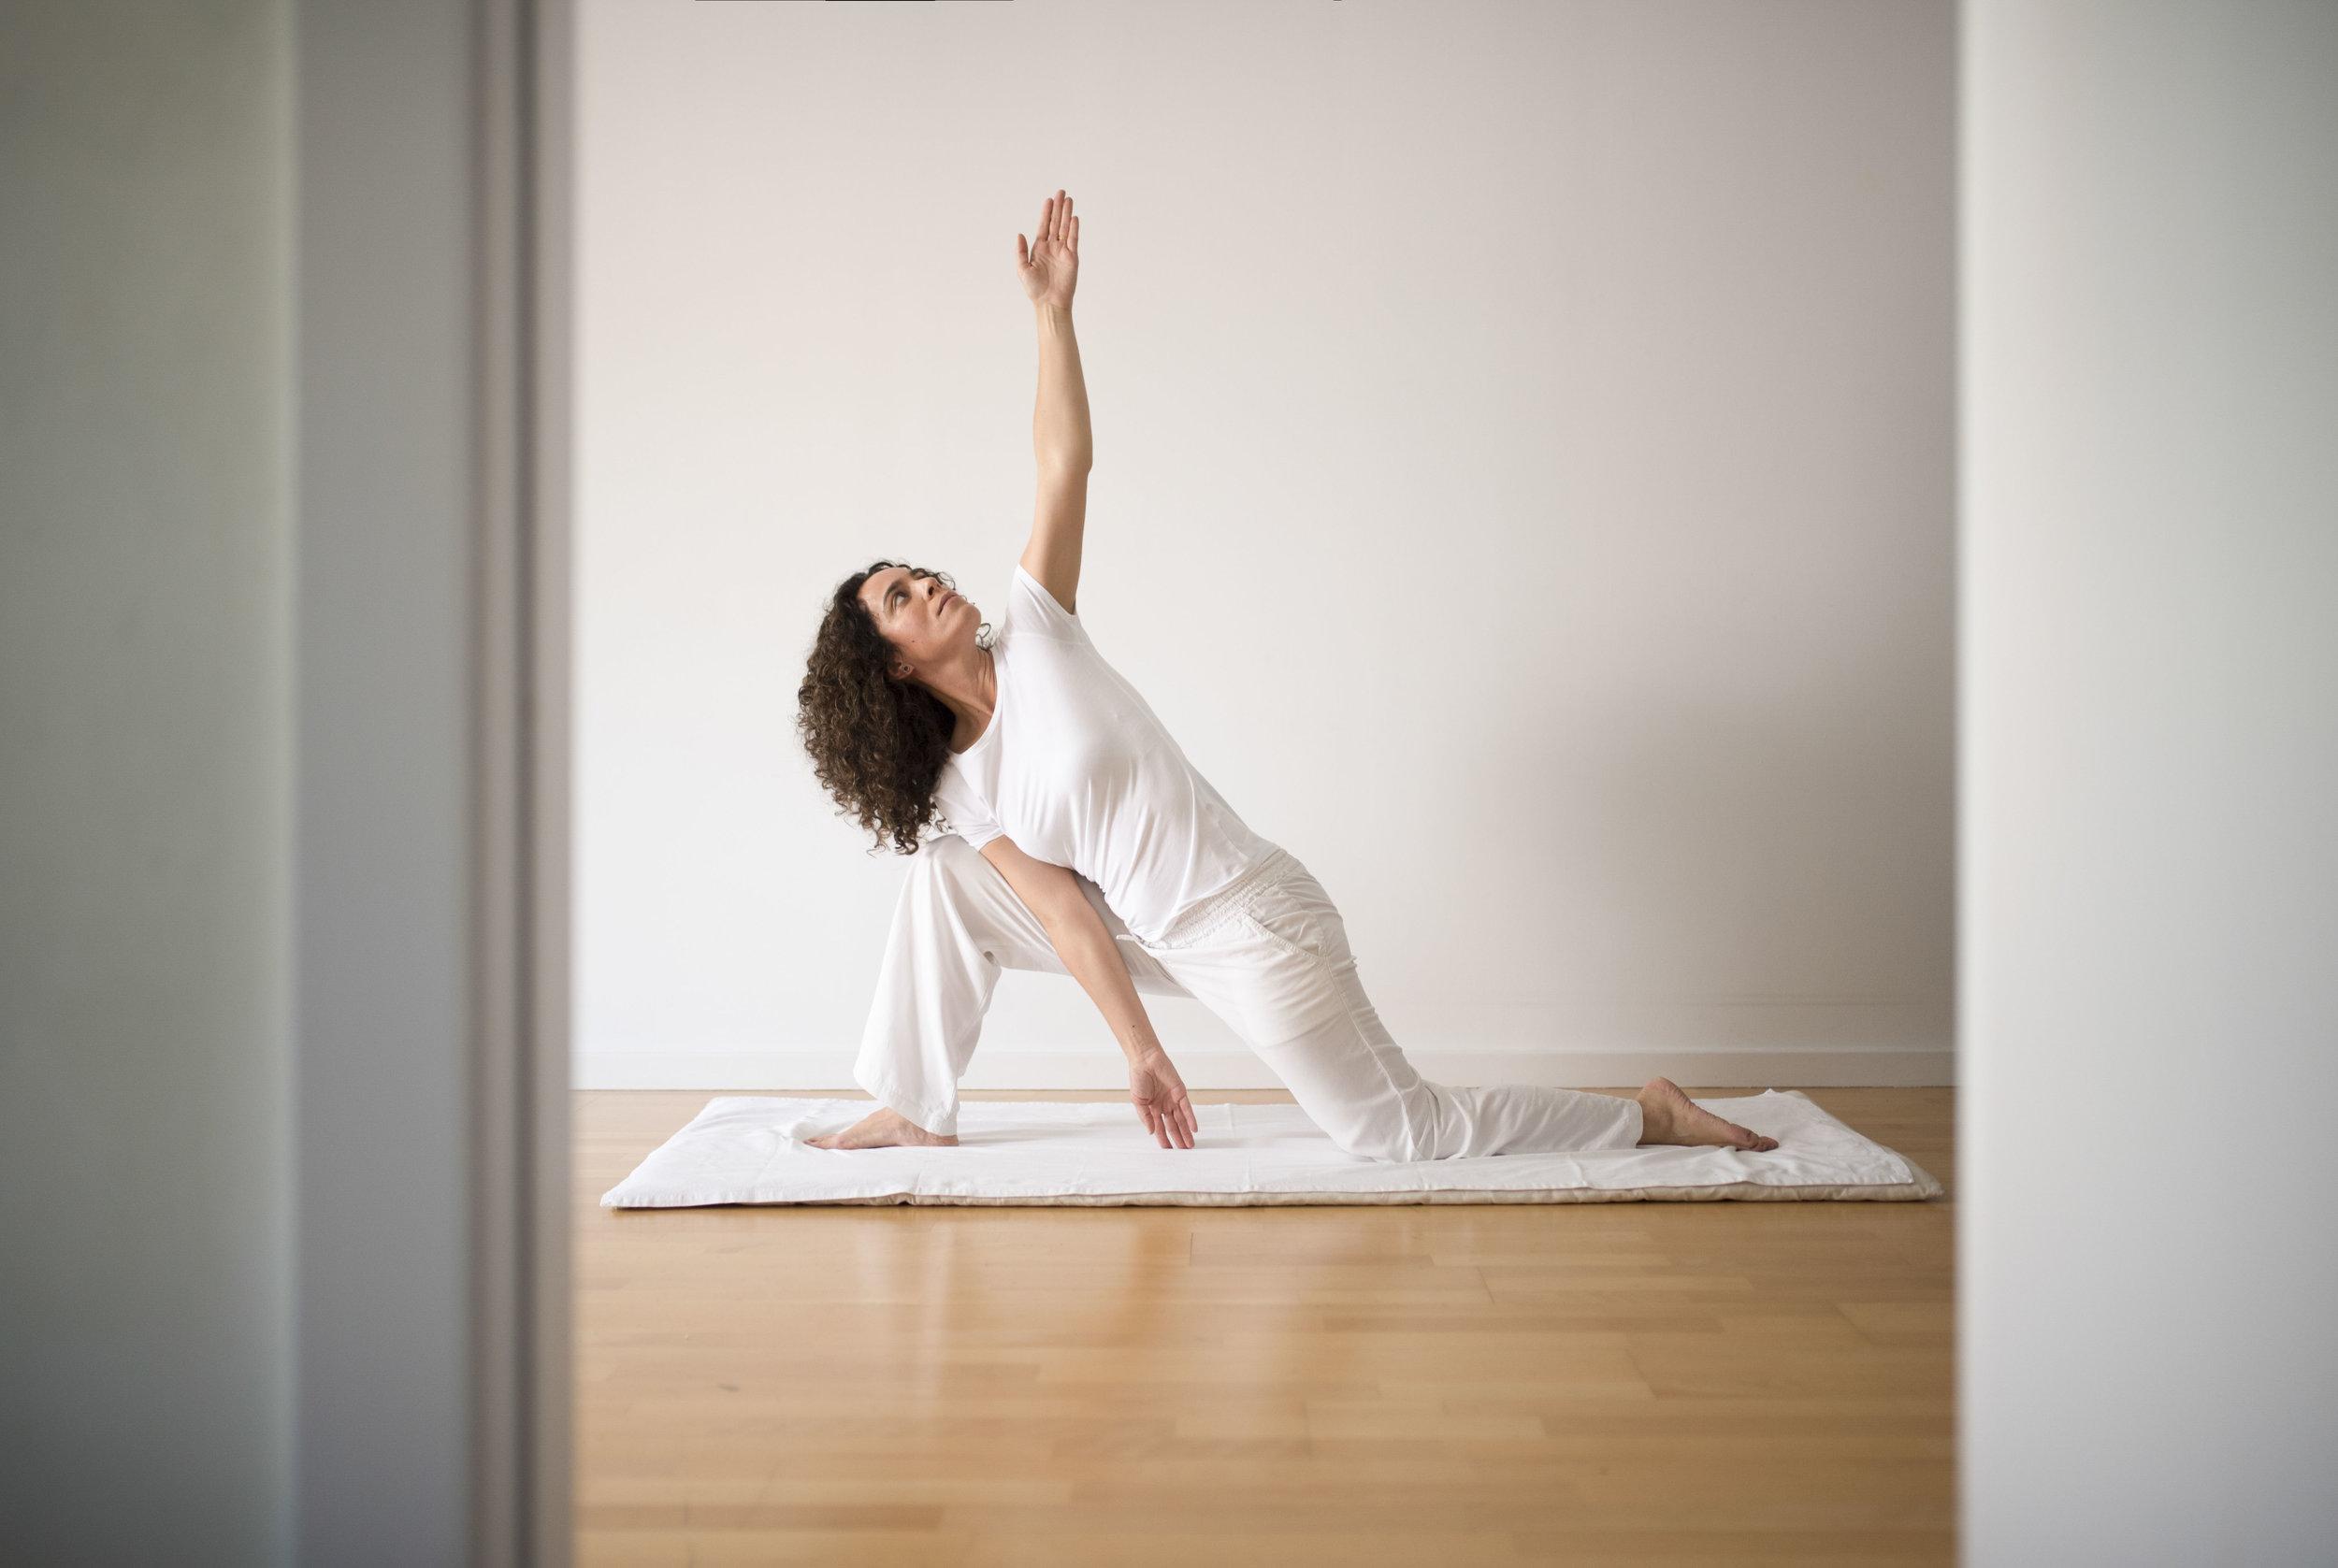 Nuria-Chalamanch_yoga_2018-06-01_gilbertbages_01.JPG